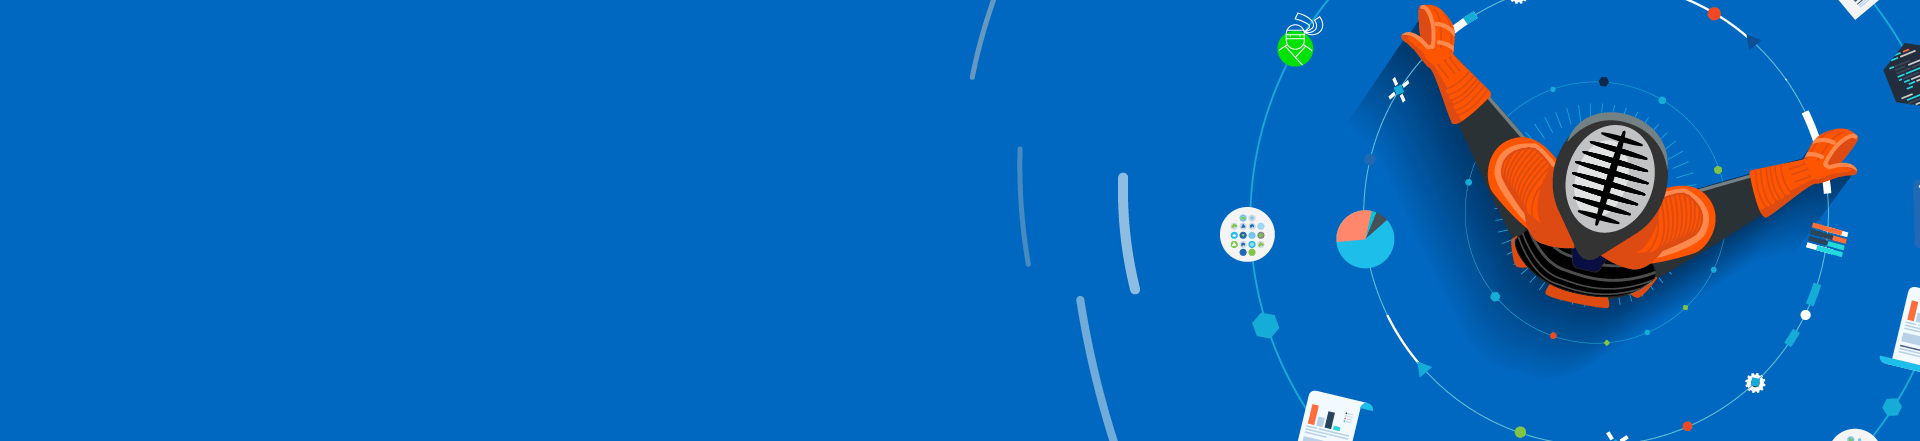 Kendo UI R3 2018